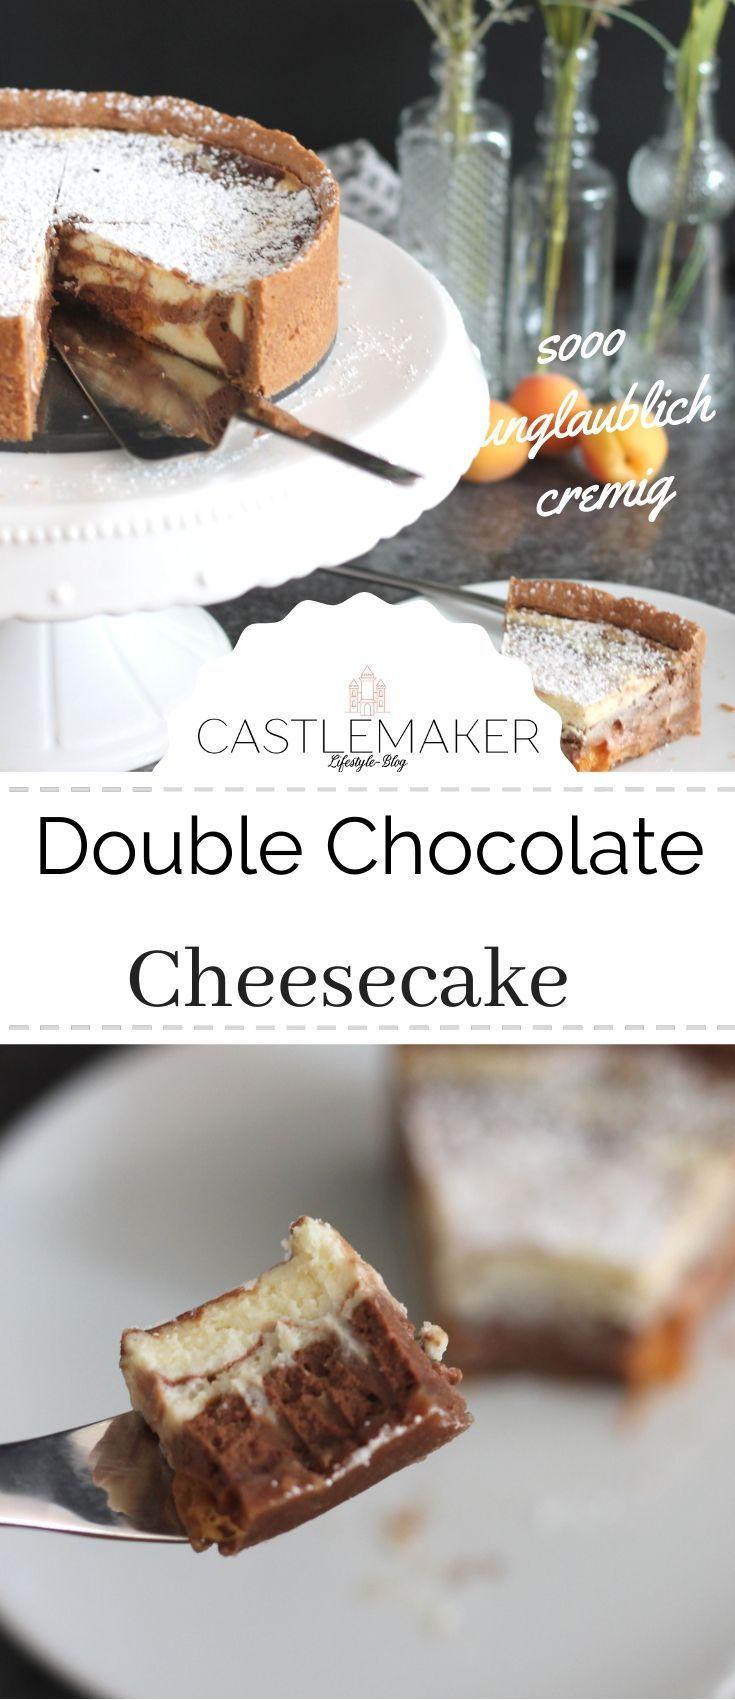 Photo of Heavenly creamy chocolate cheesecake – Chocolate Cheesecake «CASTLEMAKER Lifestyle Blog